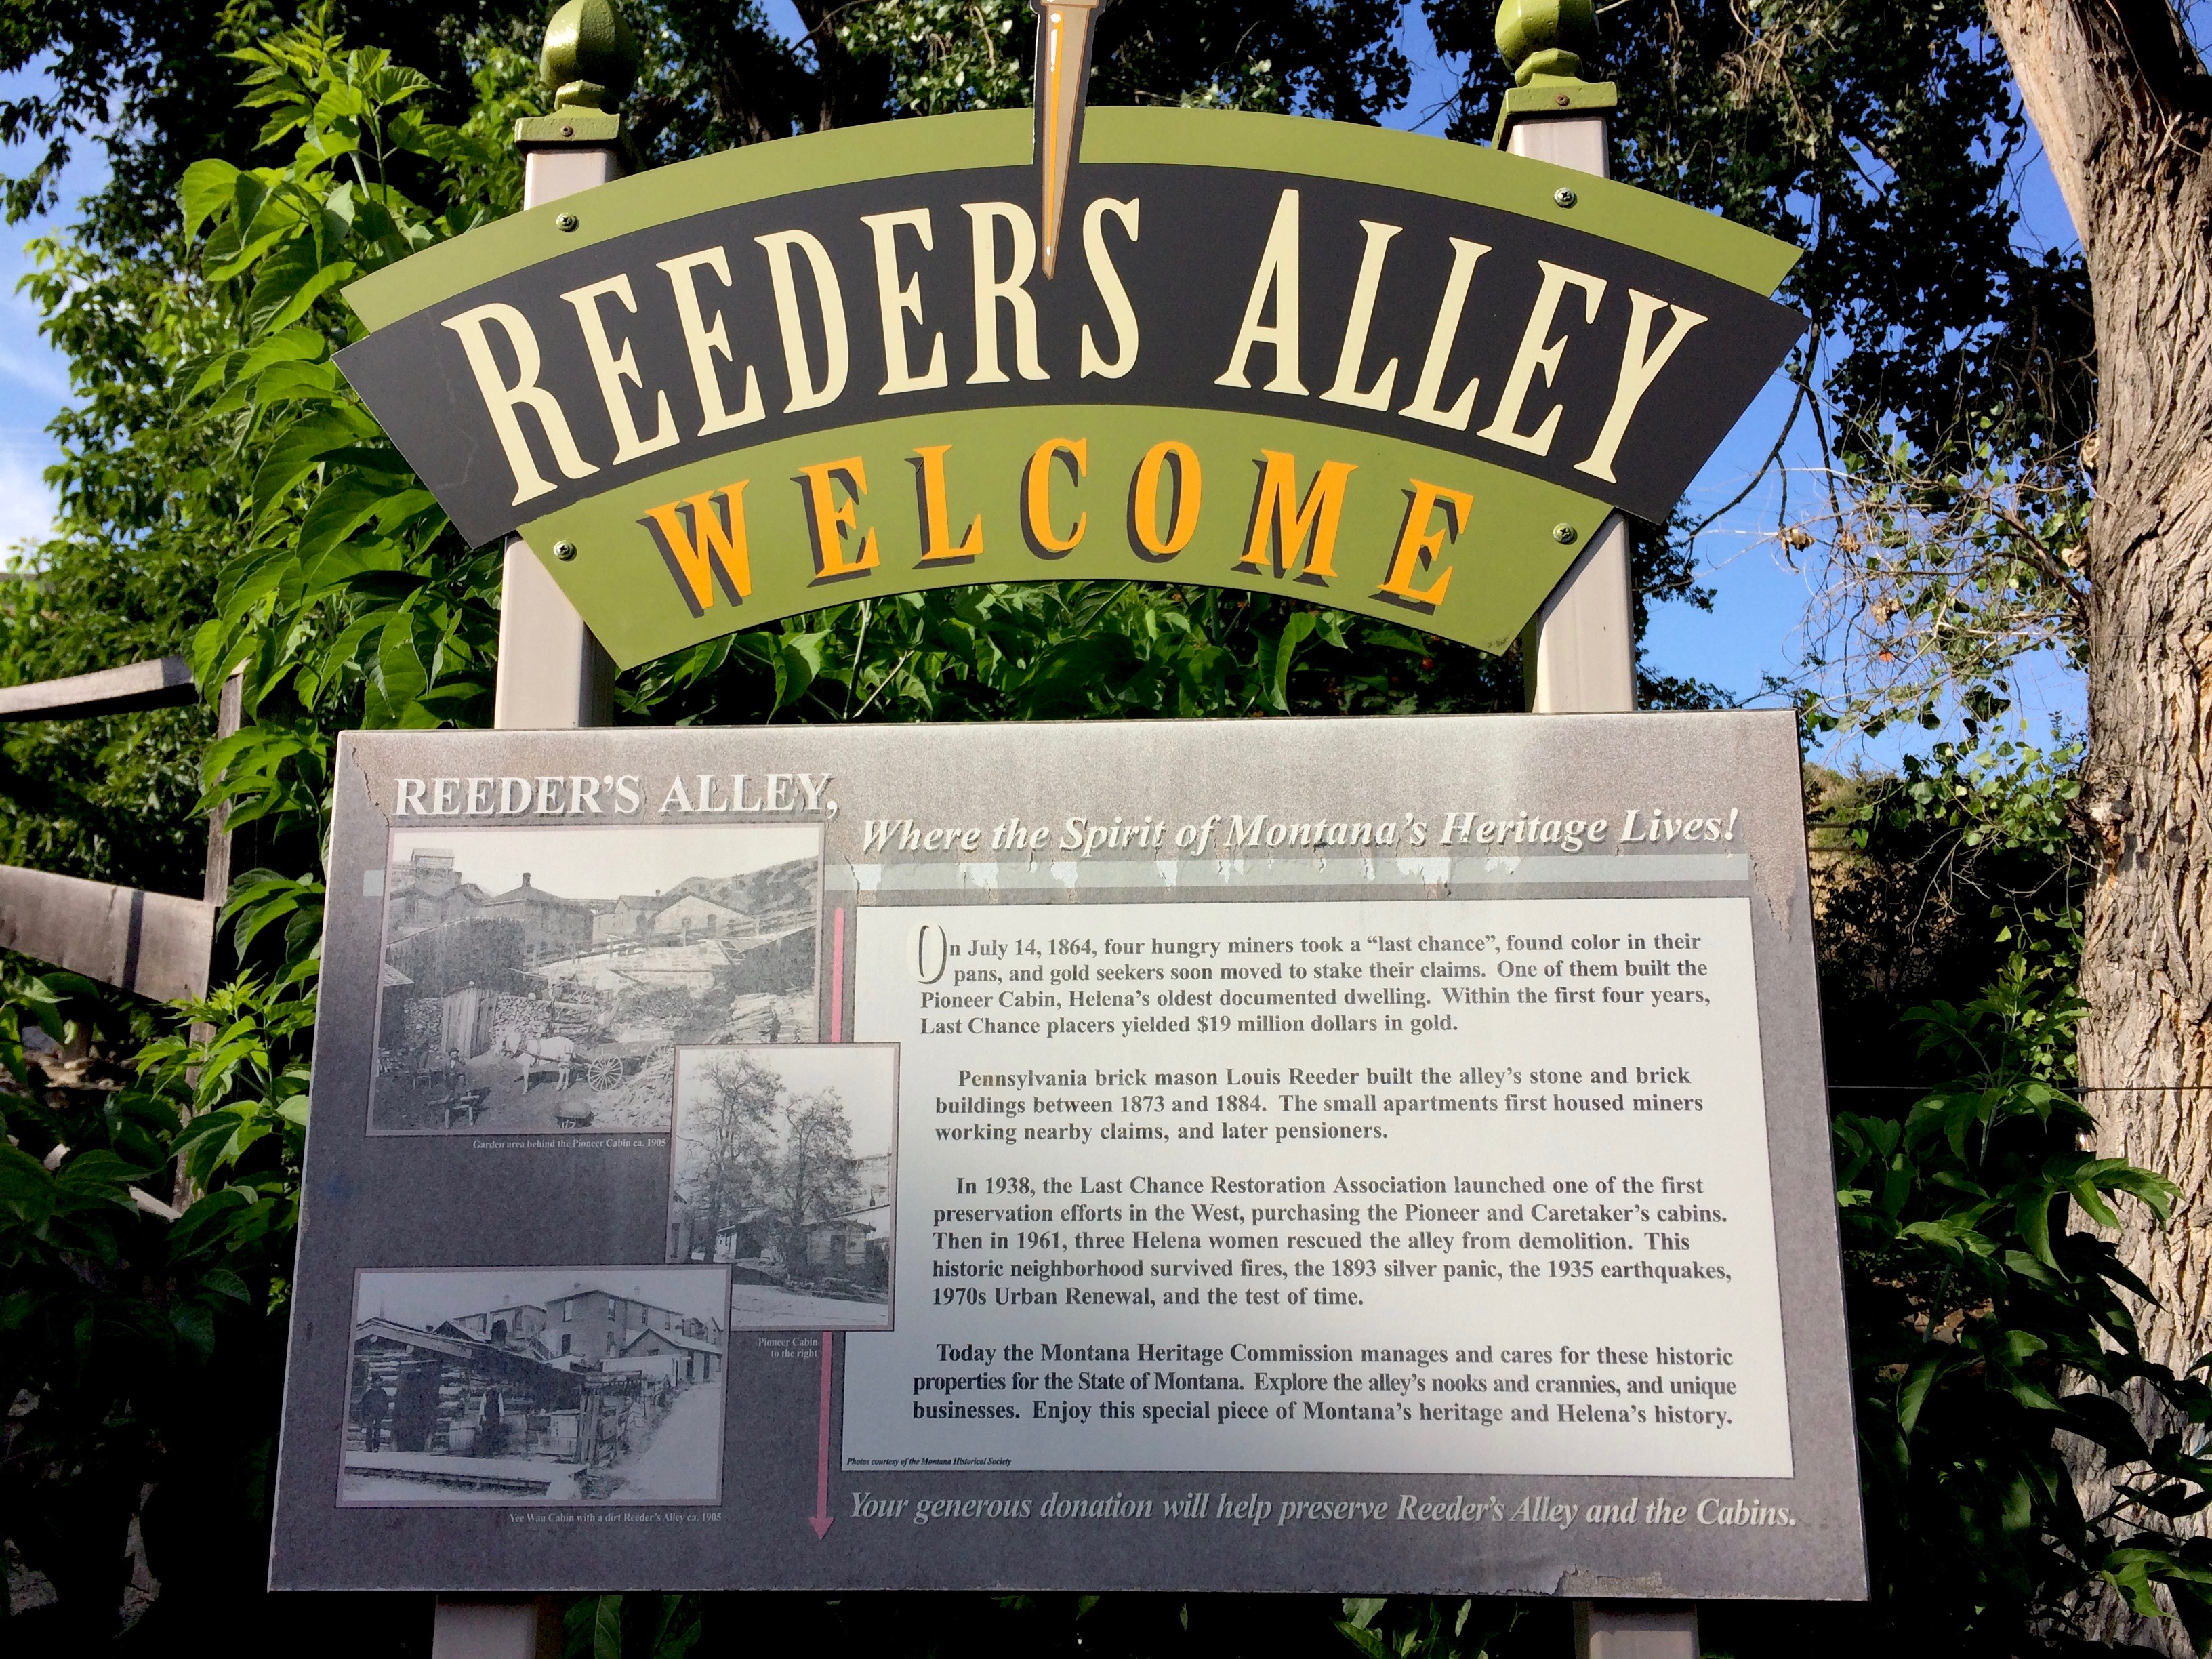 Reeders Alley signage